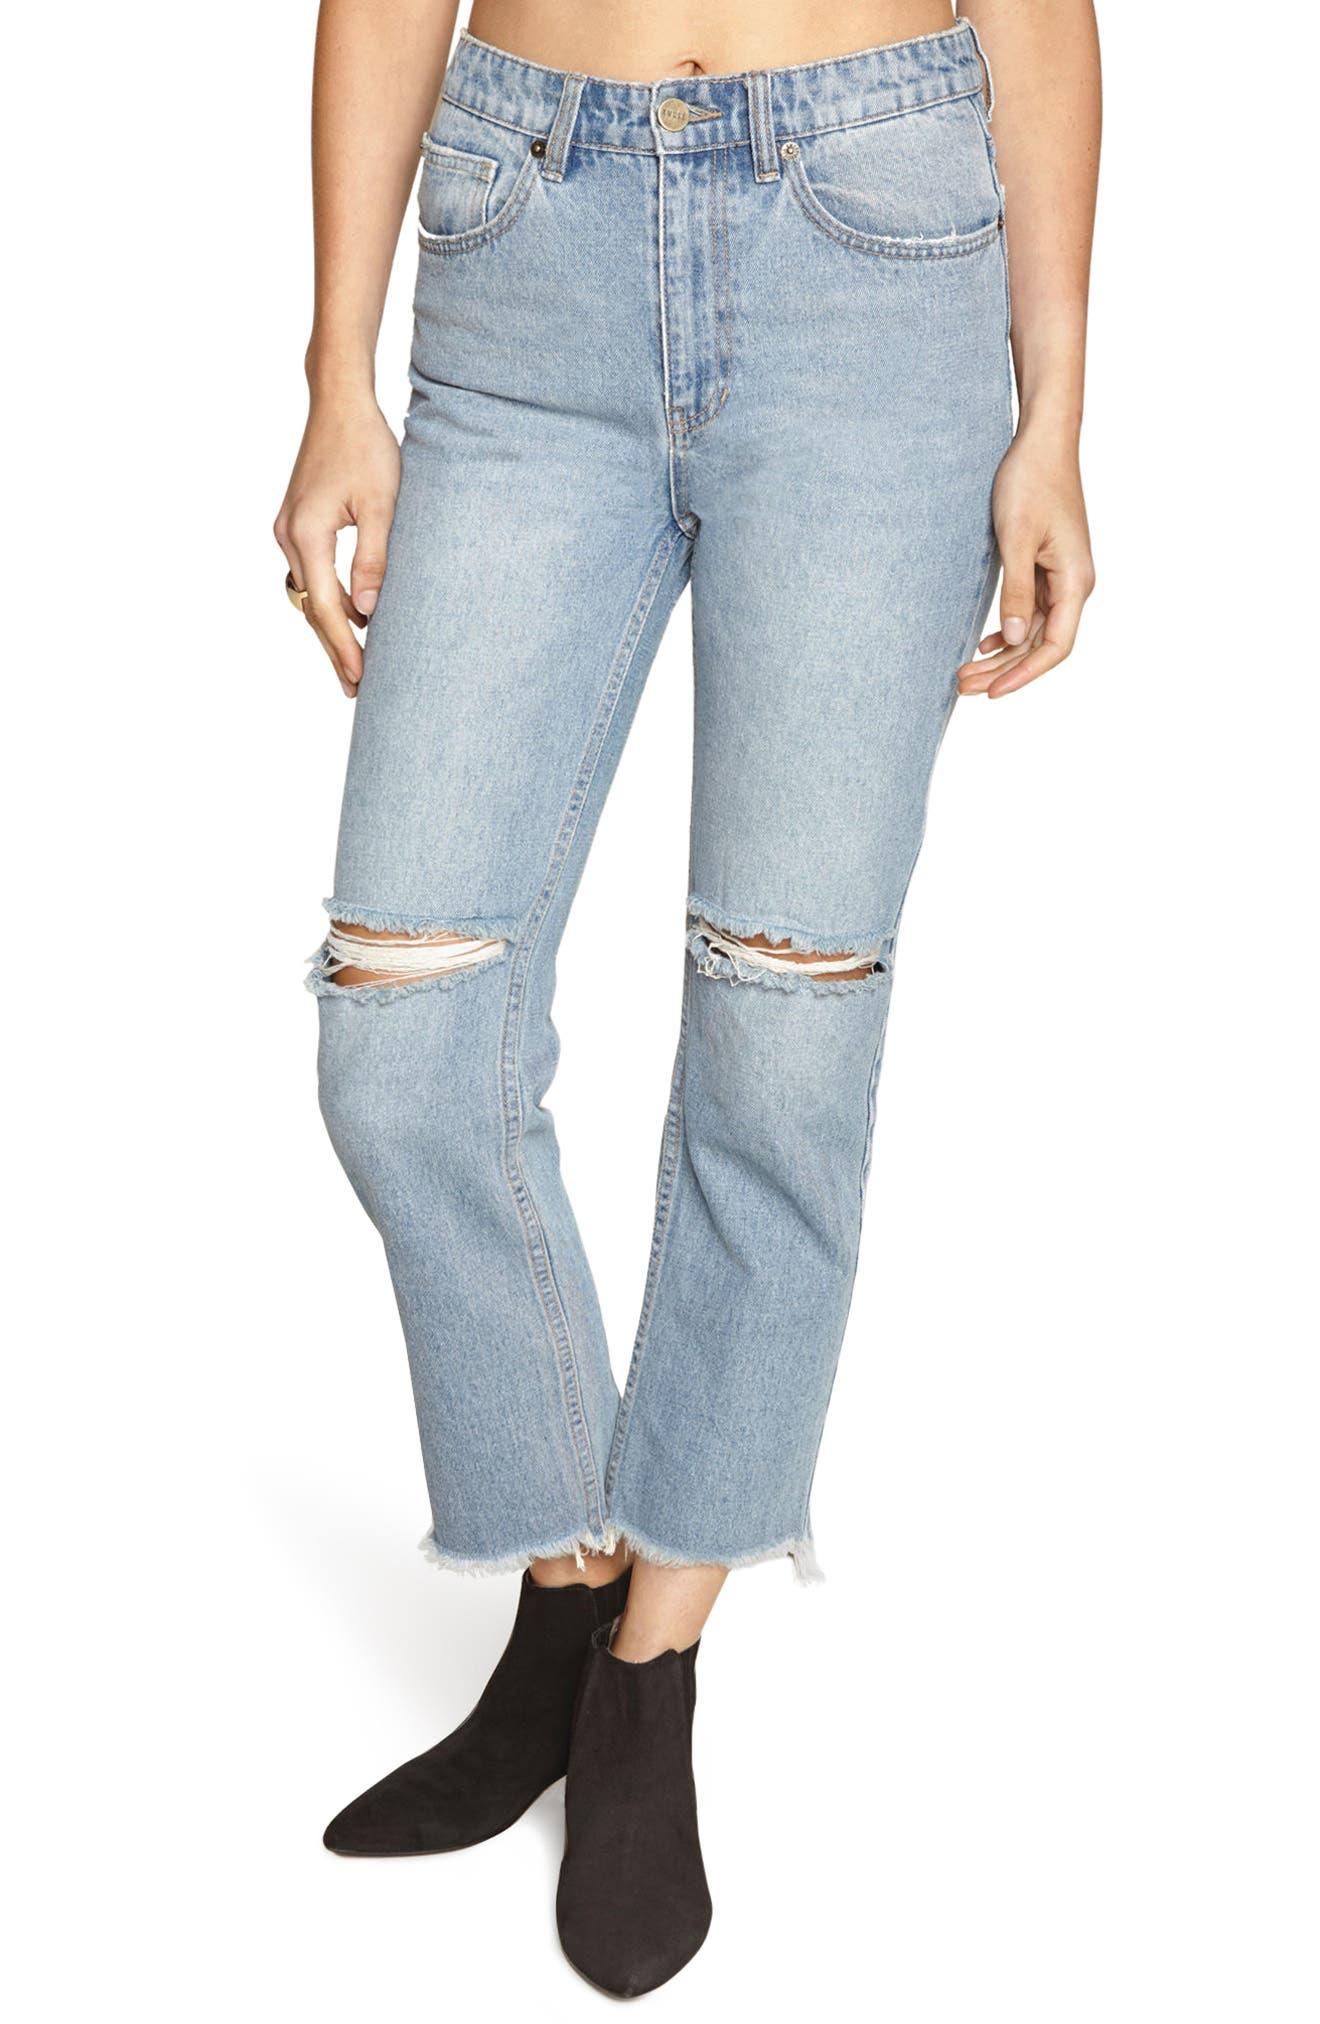 AMUSE SOCIETY Jennings Jeans